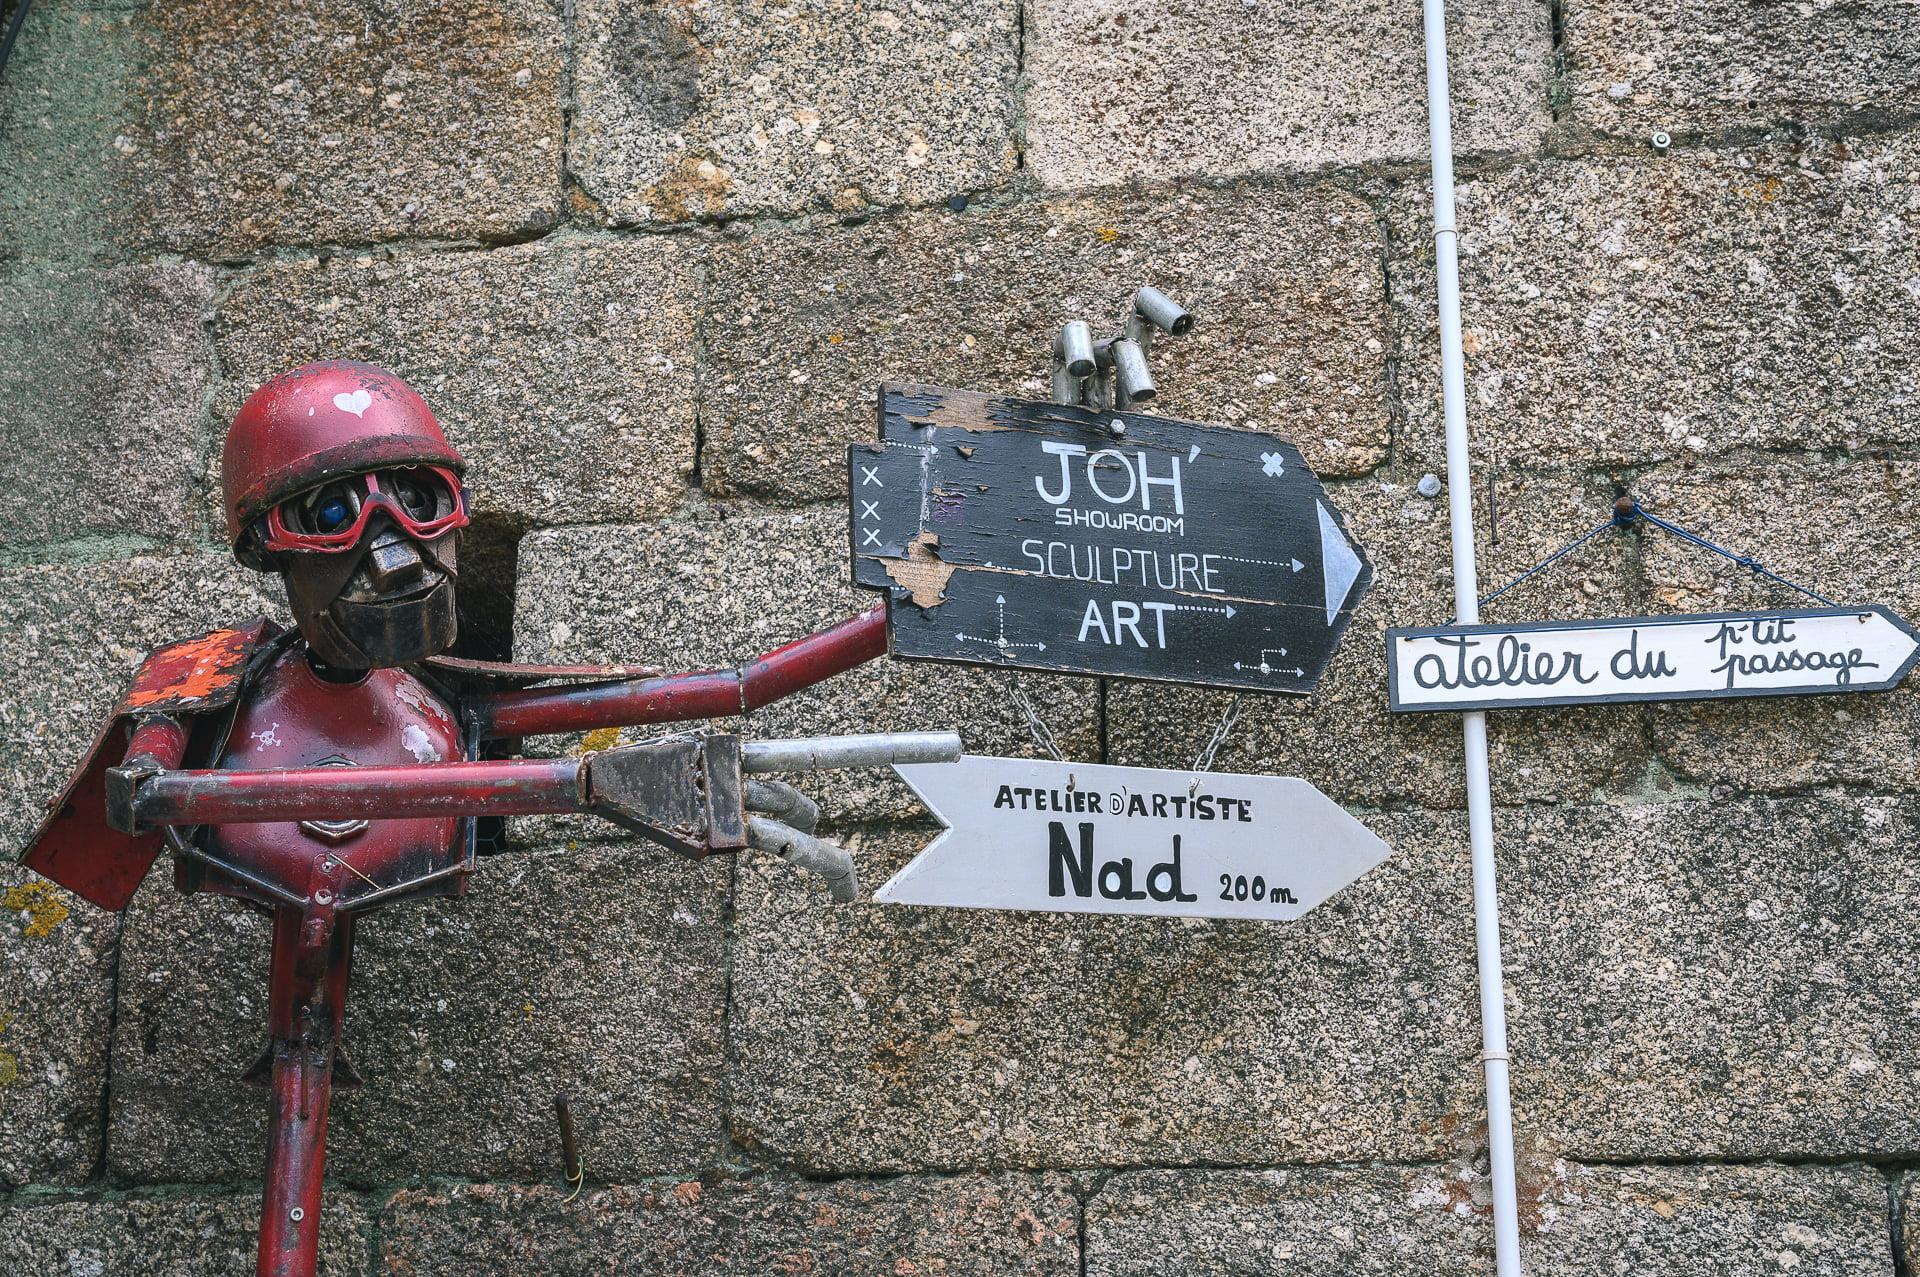 tourisme Belle-Isle-en-Terre, atelier d'artiste